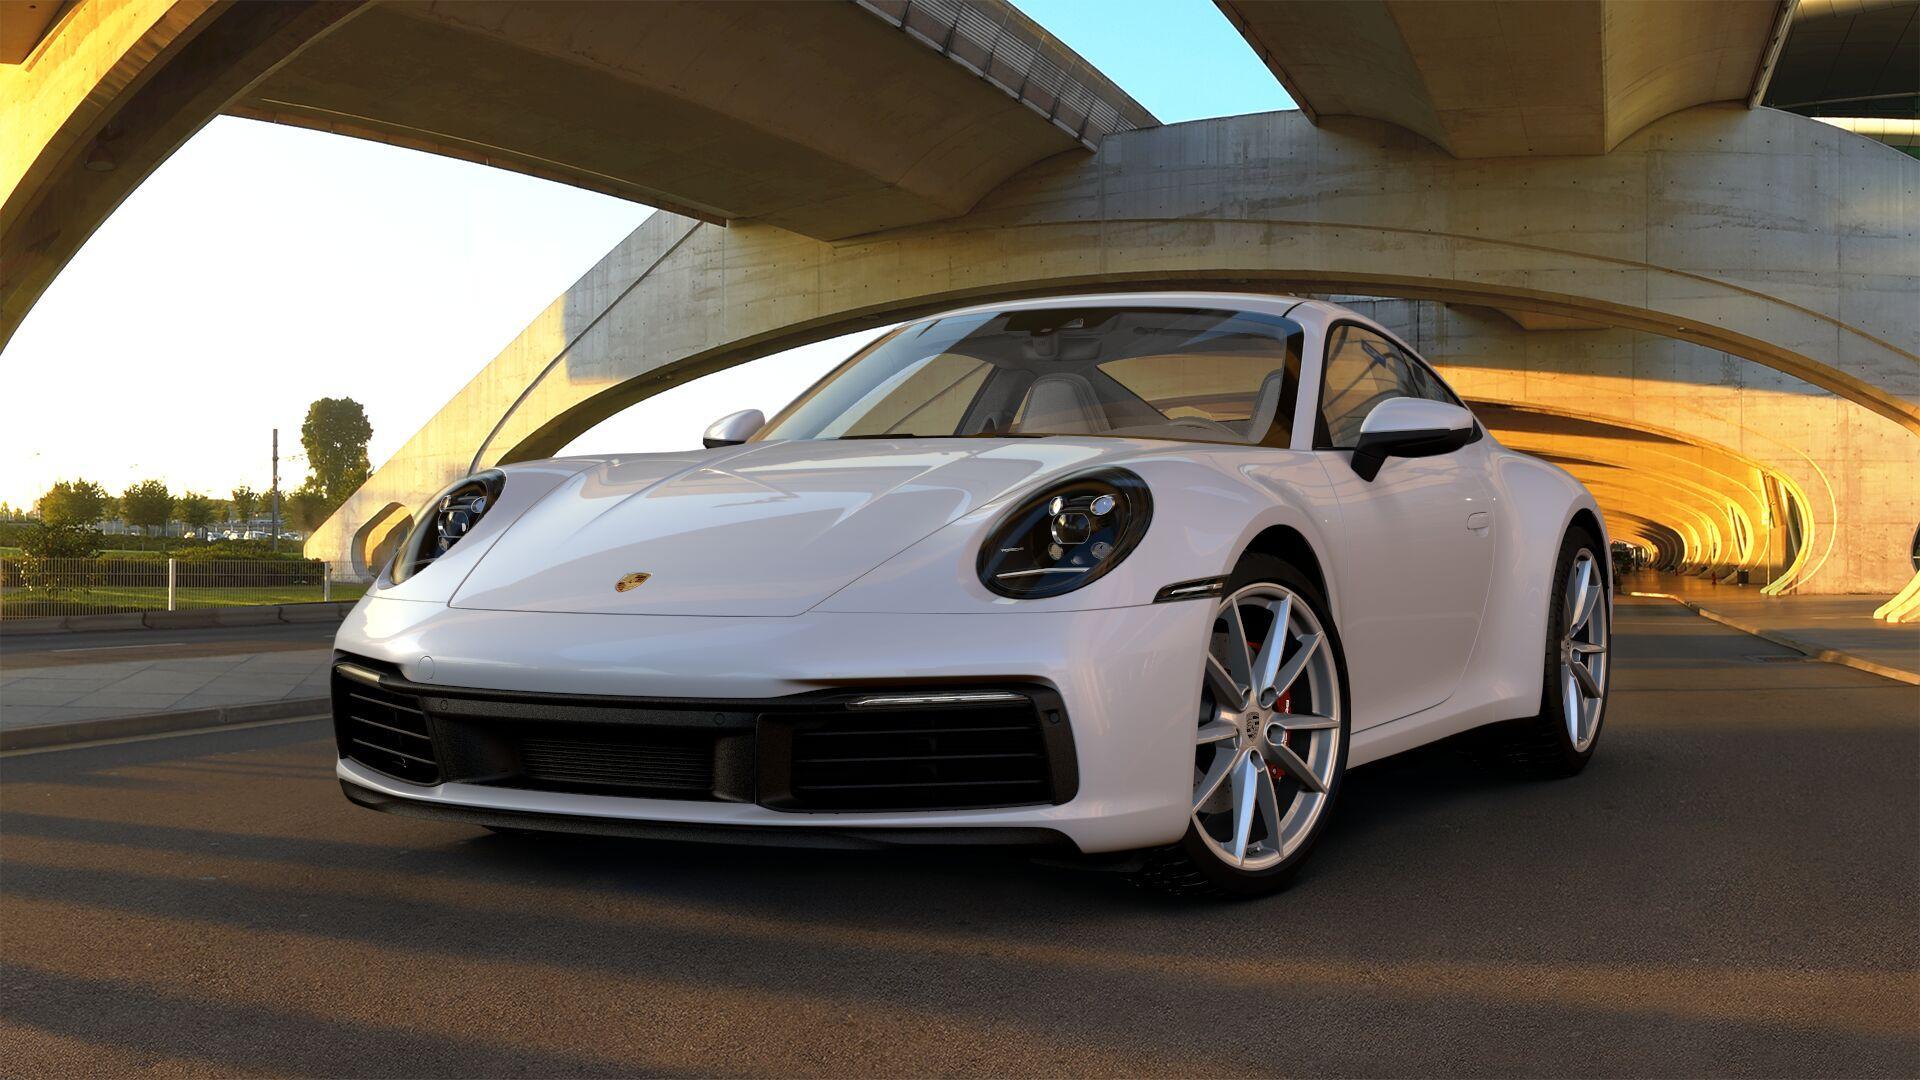 Porsche 911 Carrera S 992 Laptimes Specs Performance Data